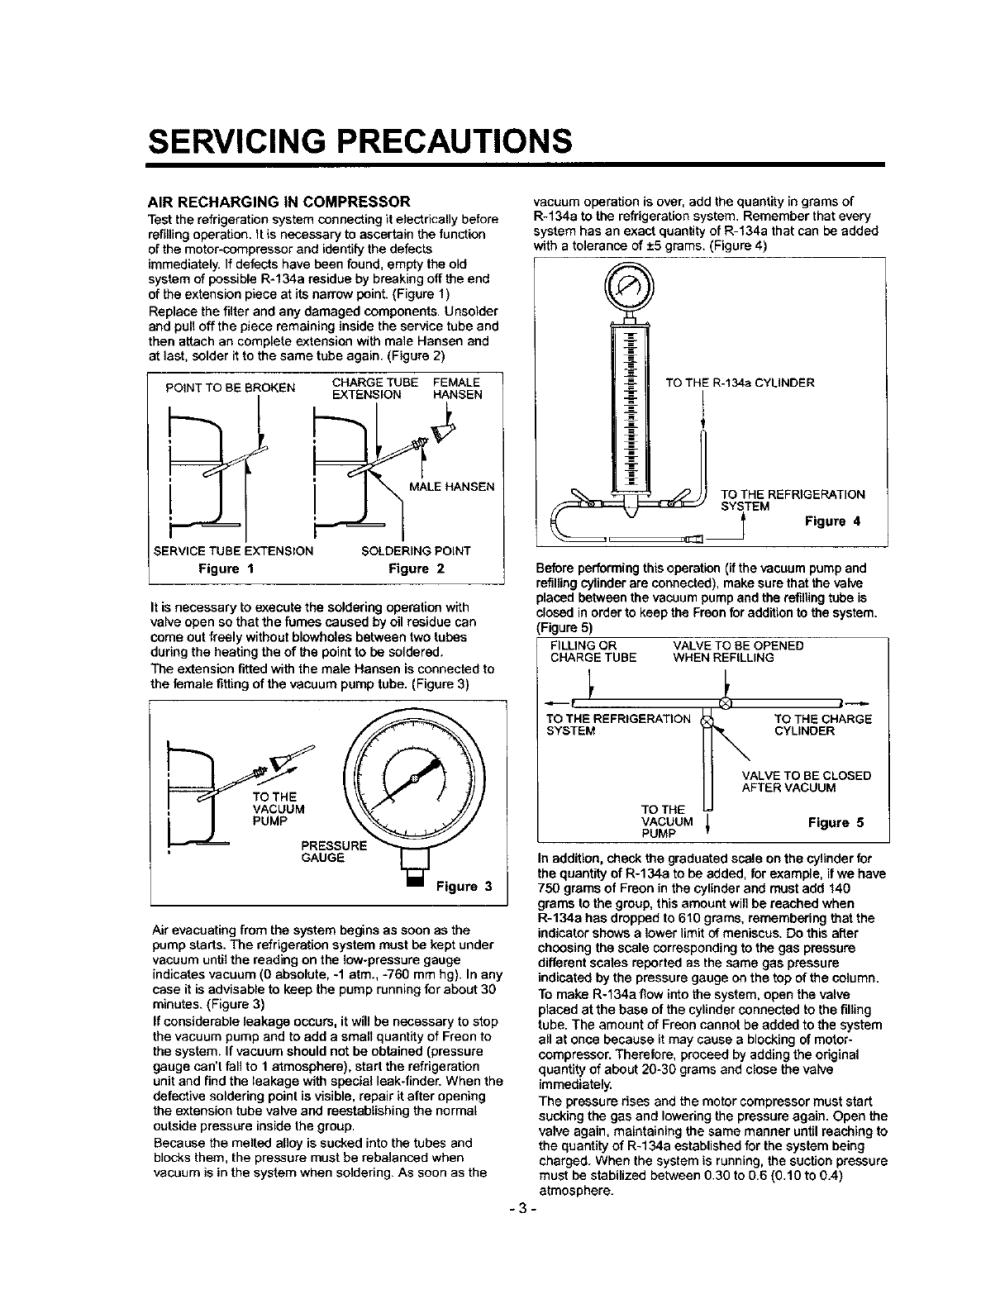 medium resolution of lg top mount refrigerator manual l0301143 lg top mount refrigerator owner s manual lg top mount refrigerator installation guides